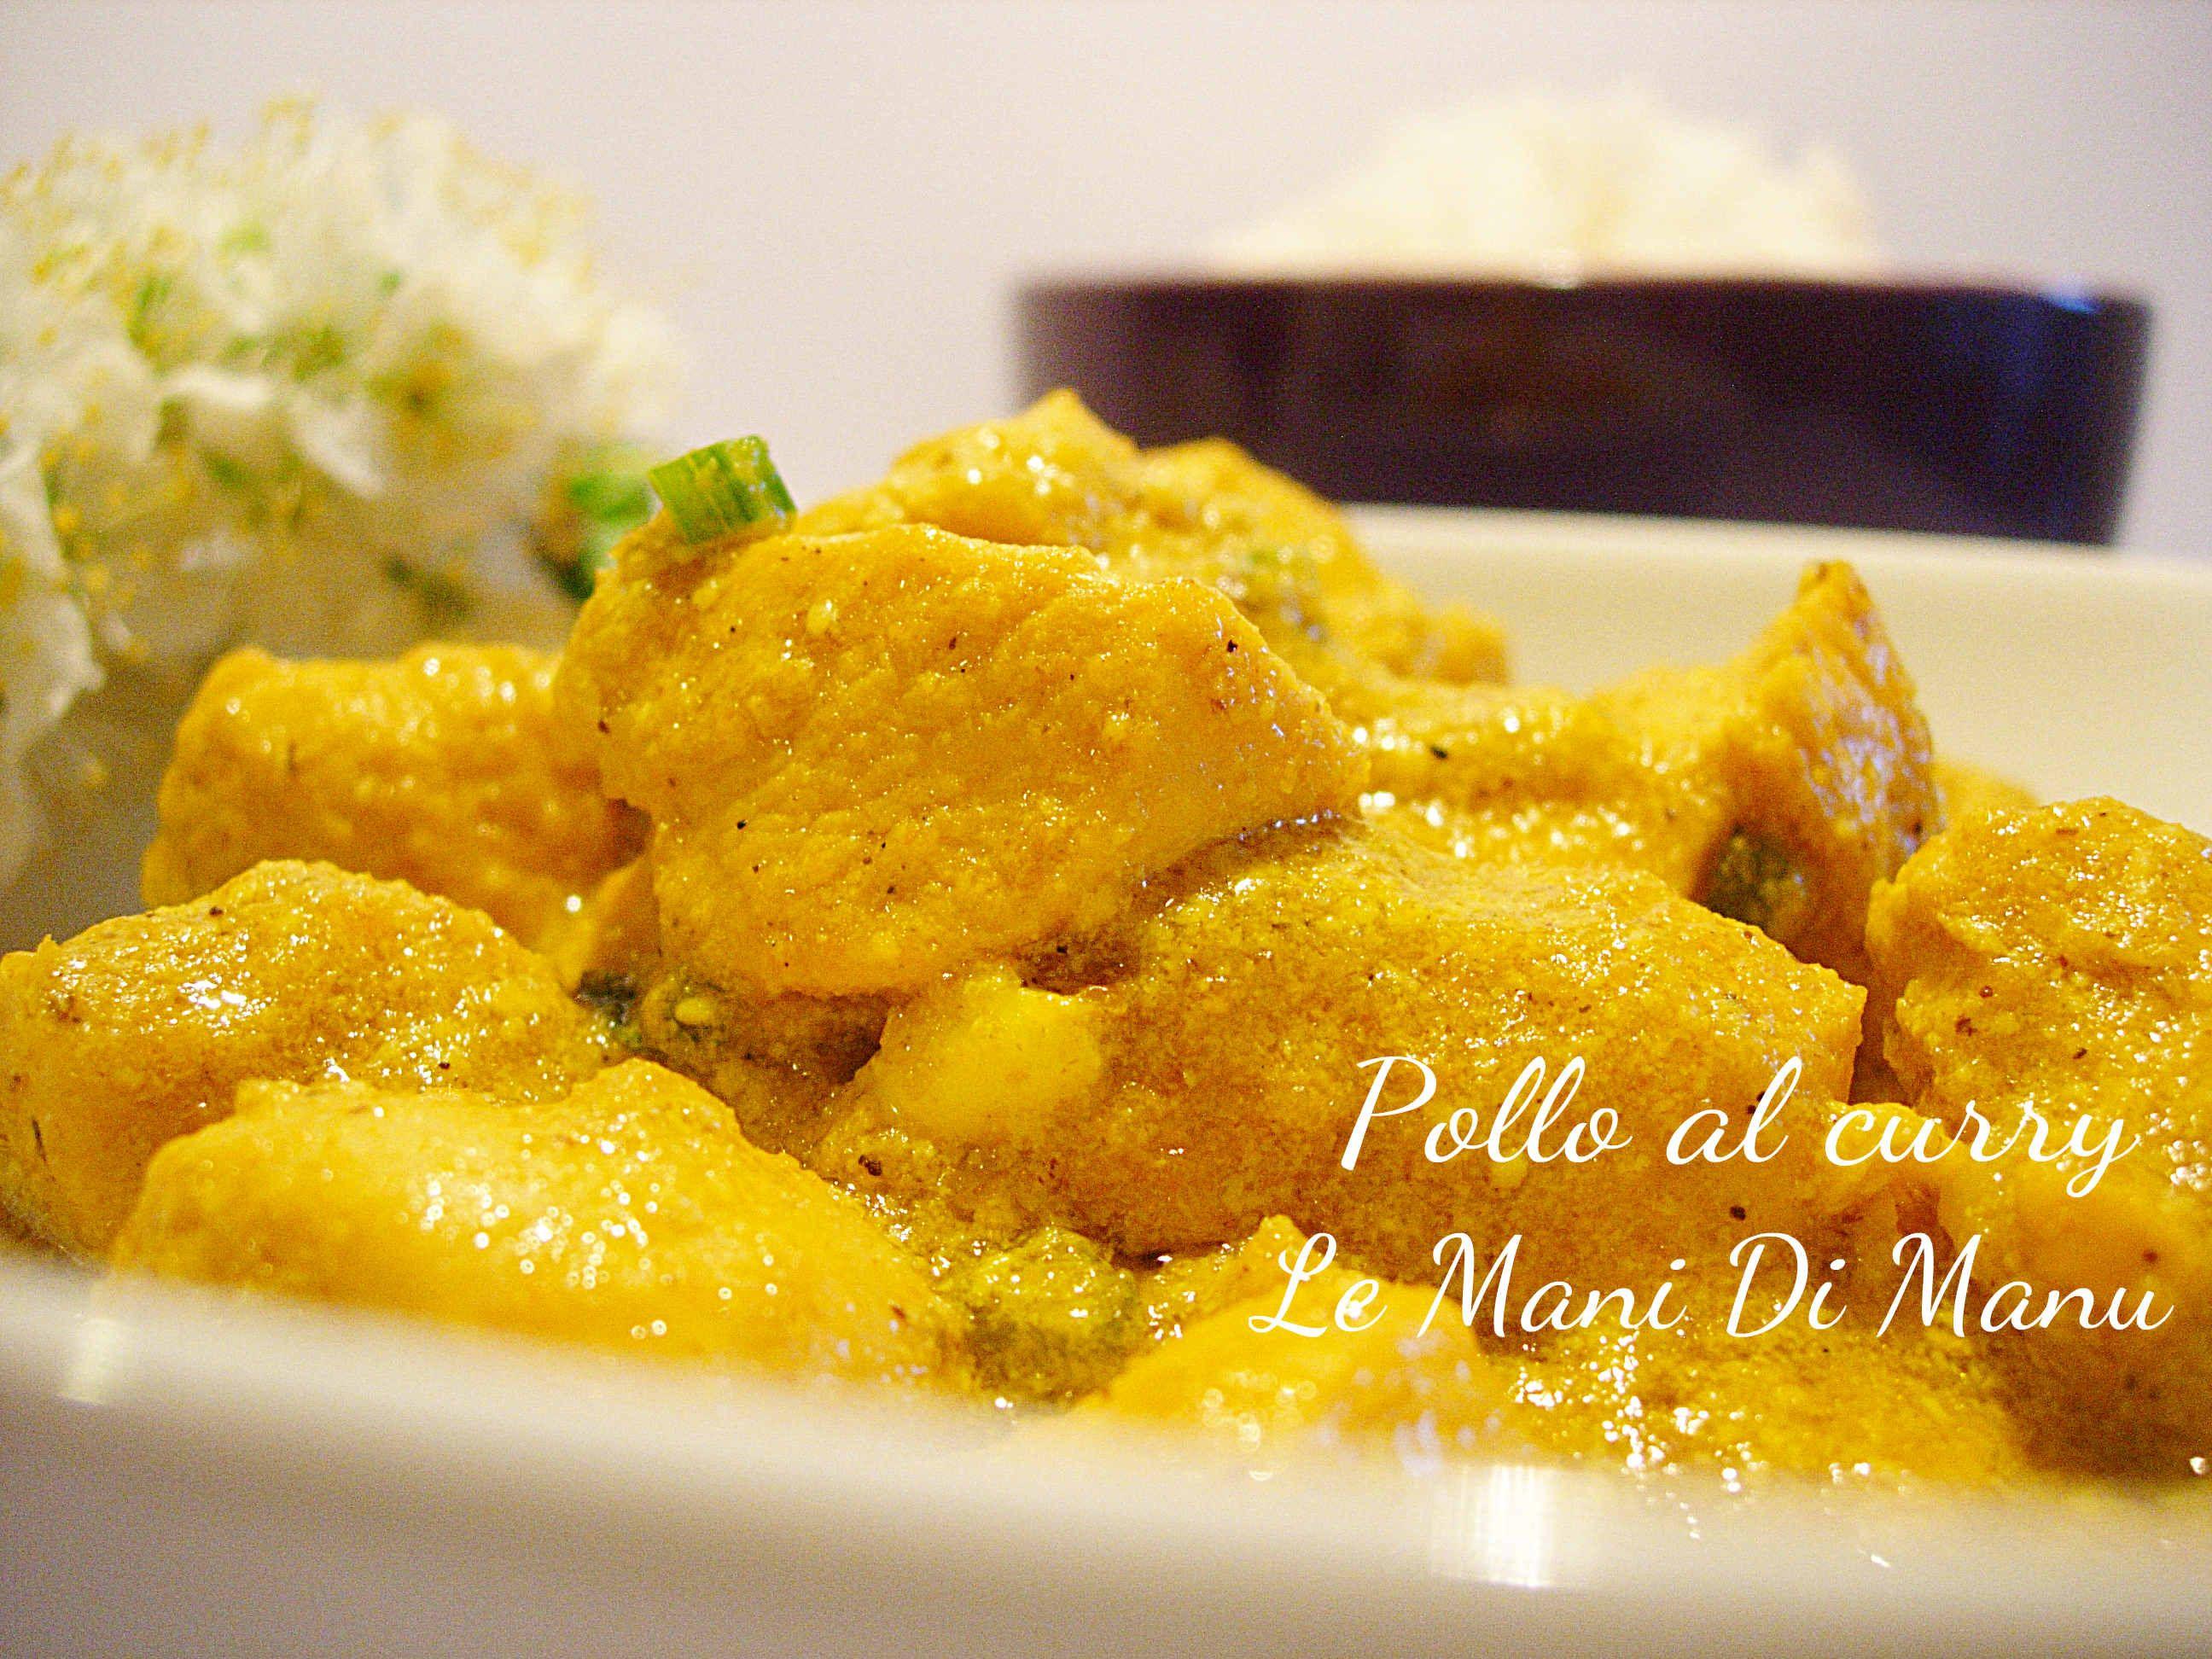 c5ef2c92ae2a24d4aa8a805c95b3f240 - Pollo Al Curry Ricette